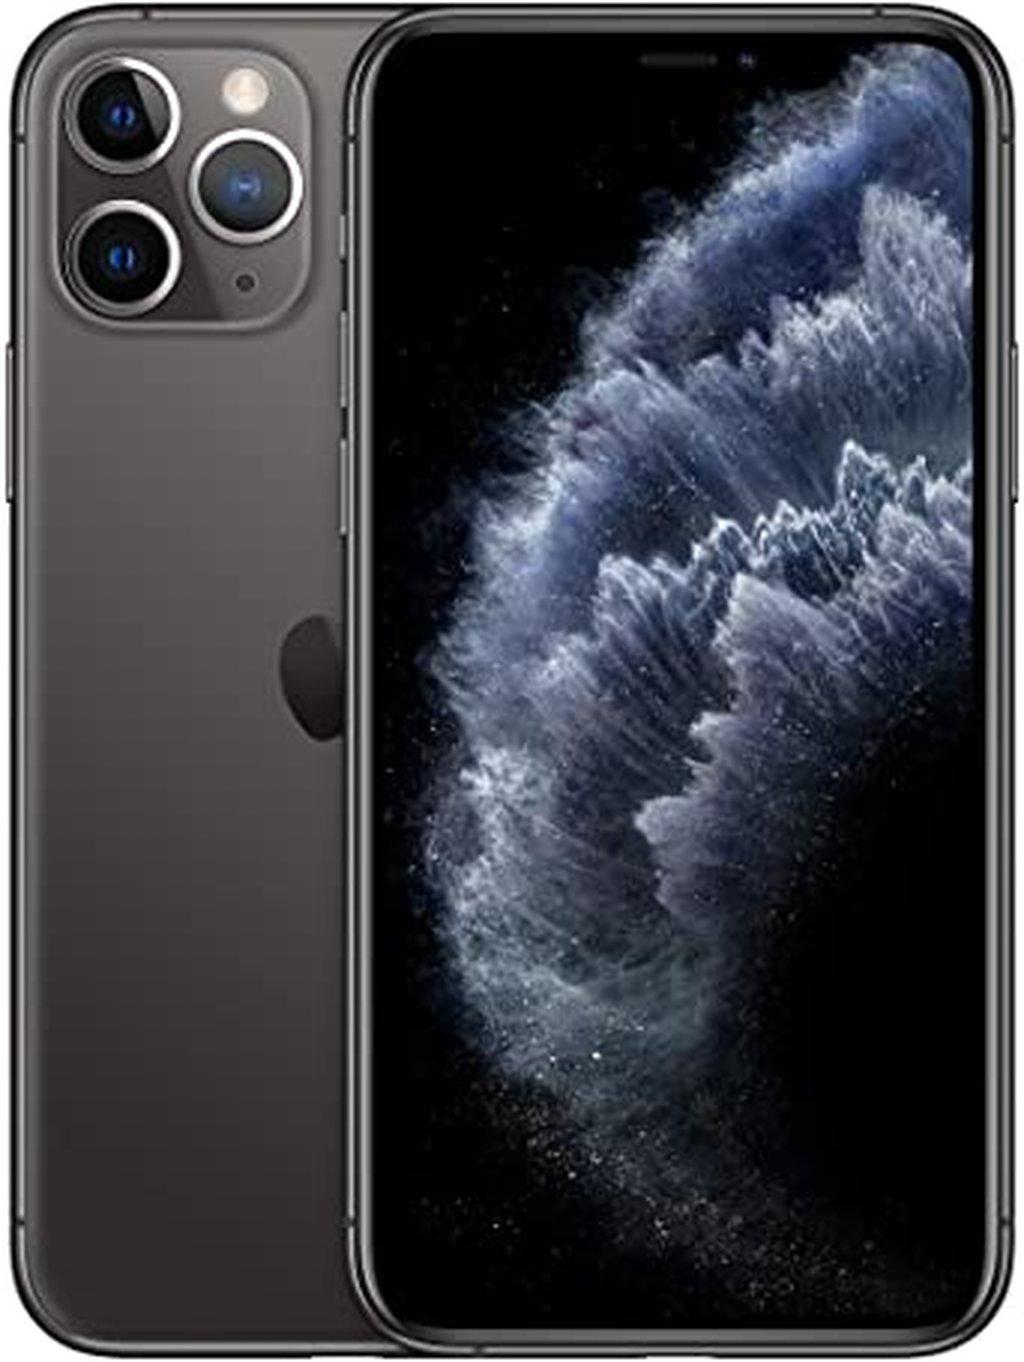 Apple iphone pro 11 brand new unlocked sim free original